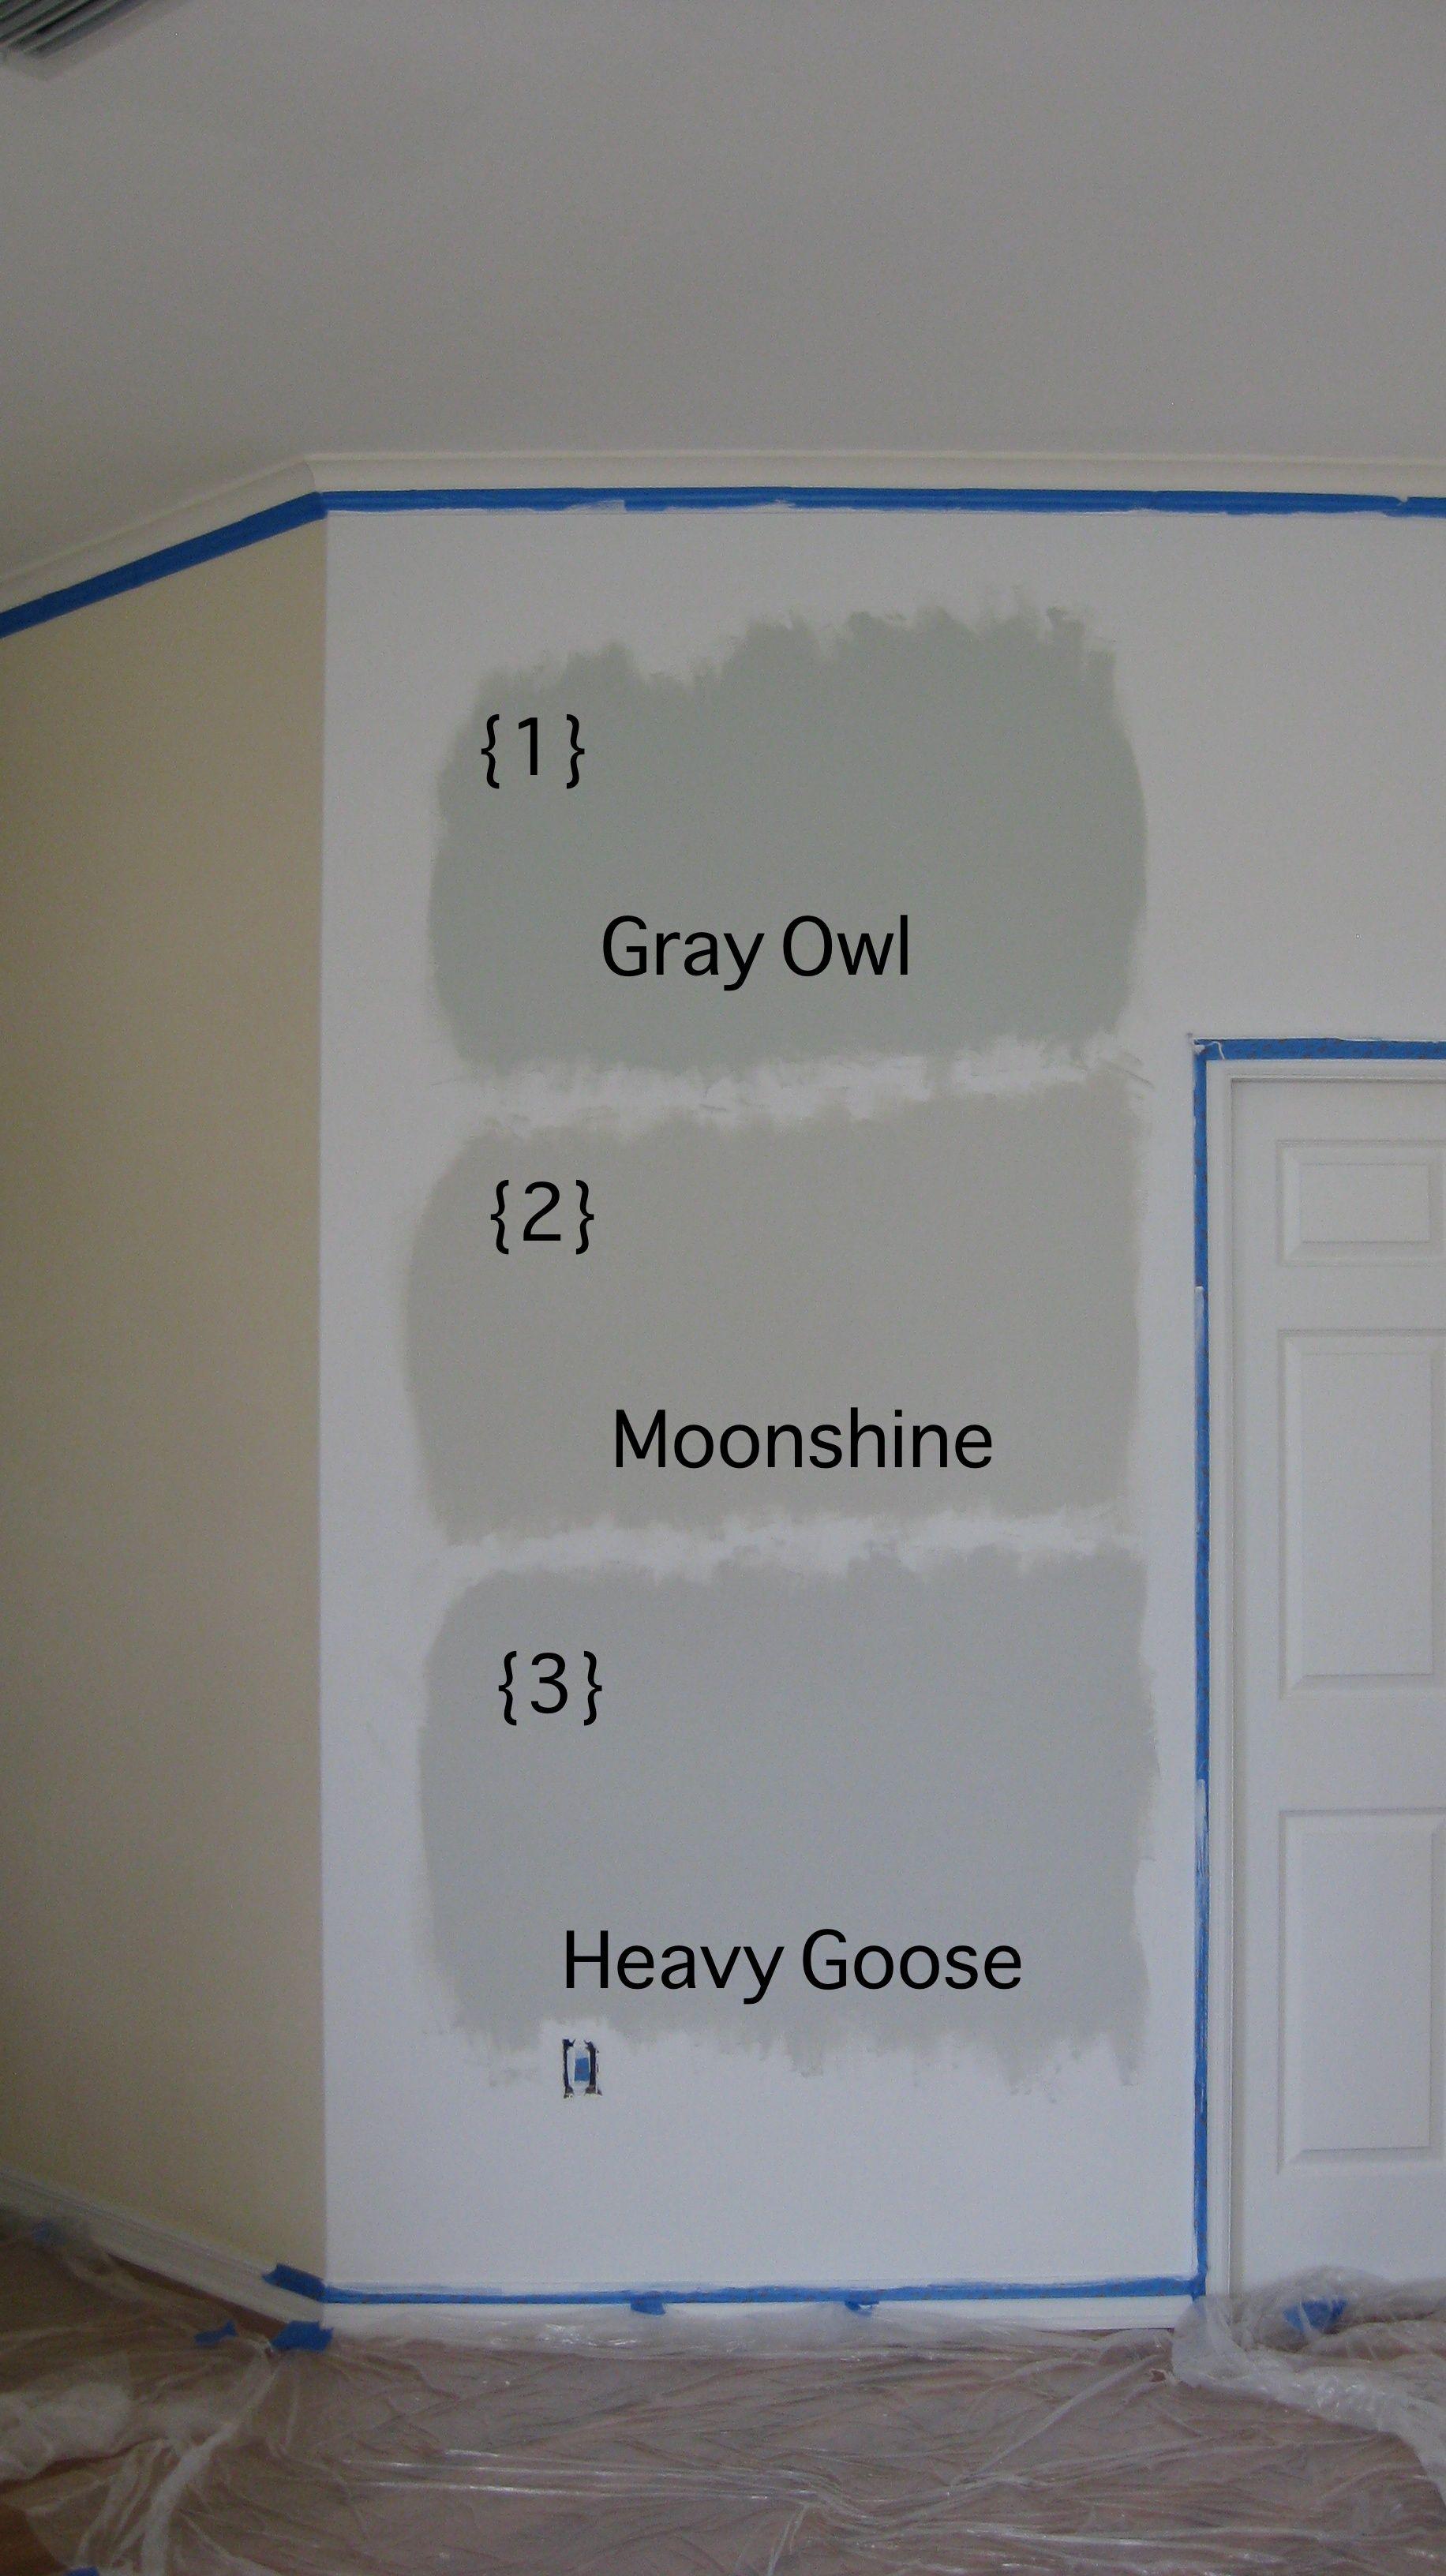 benjamin moore moonshine vs gray owl bedroom paint colors paint colors for home interior. Black Bedroom Furniture Sets. Home Design Ideas